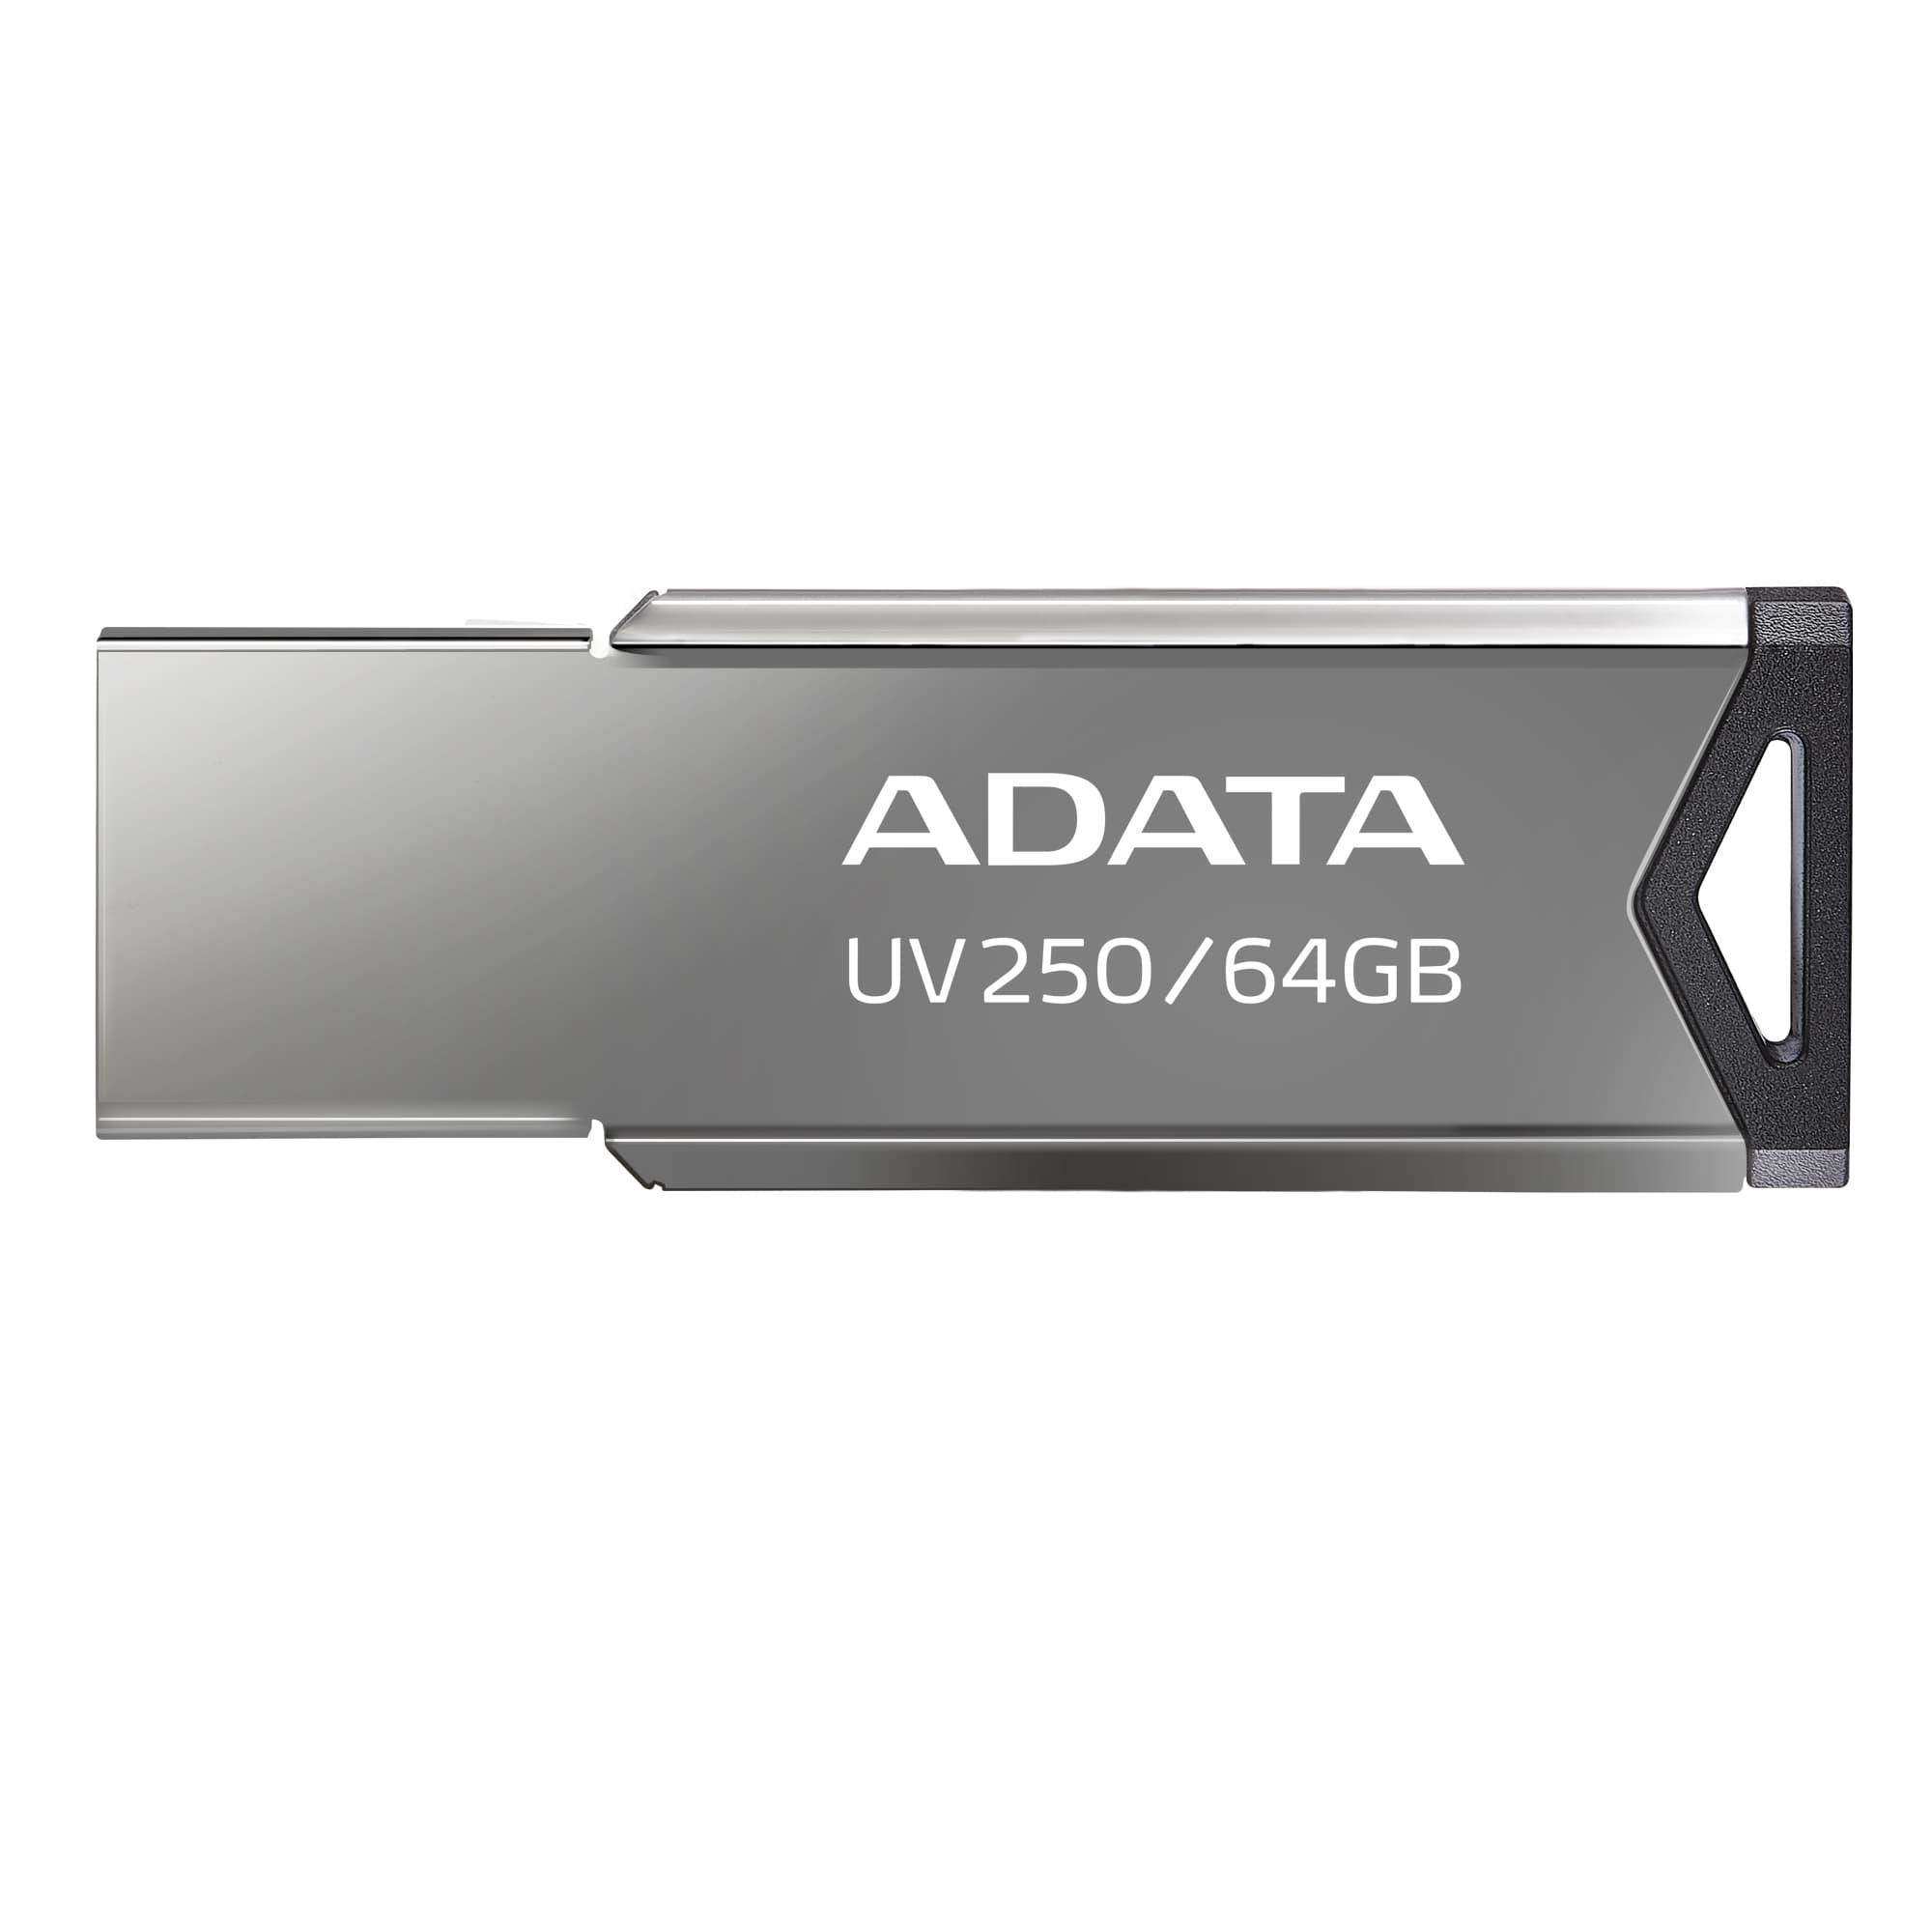 Pen Drive Adata AUV250 64GB USB 2.0